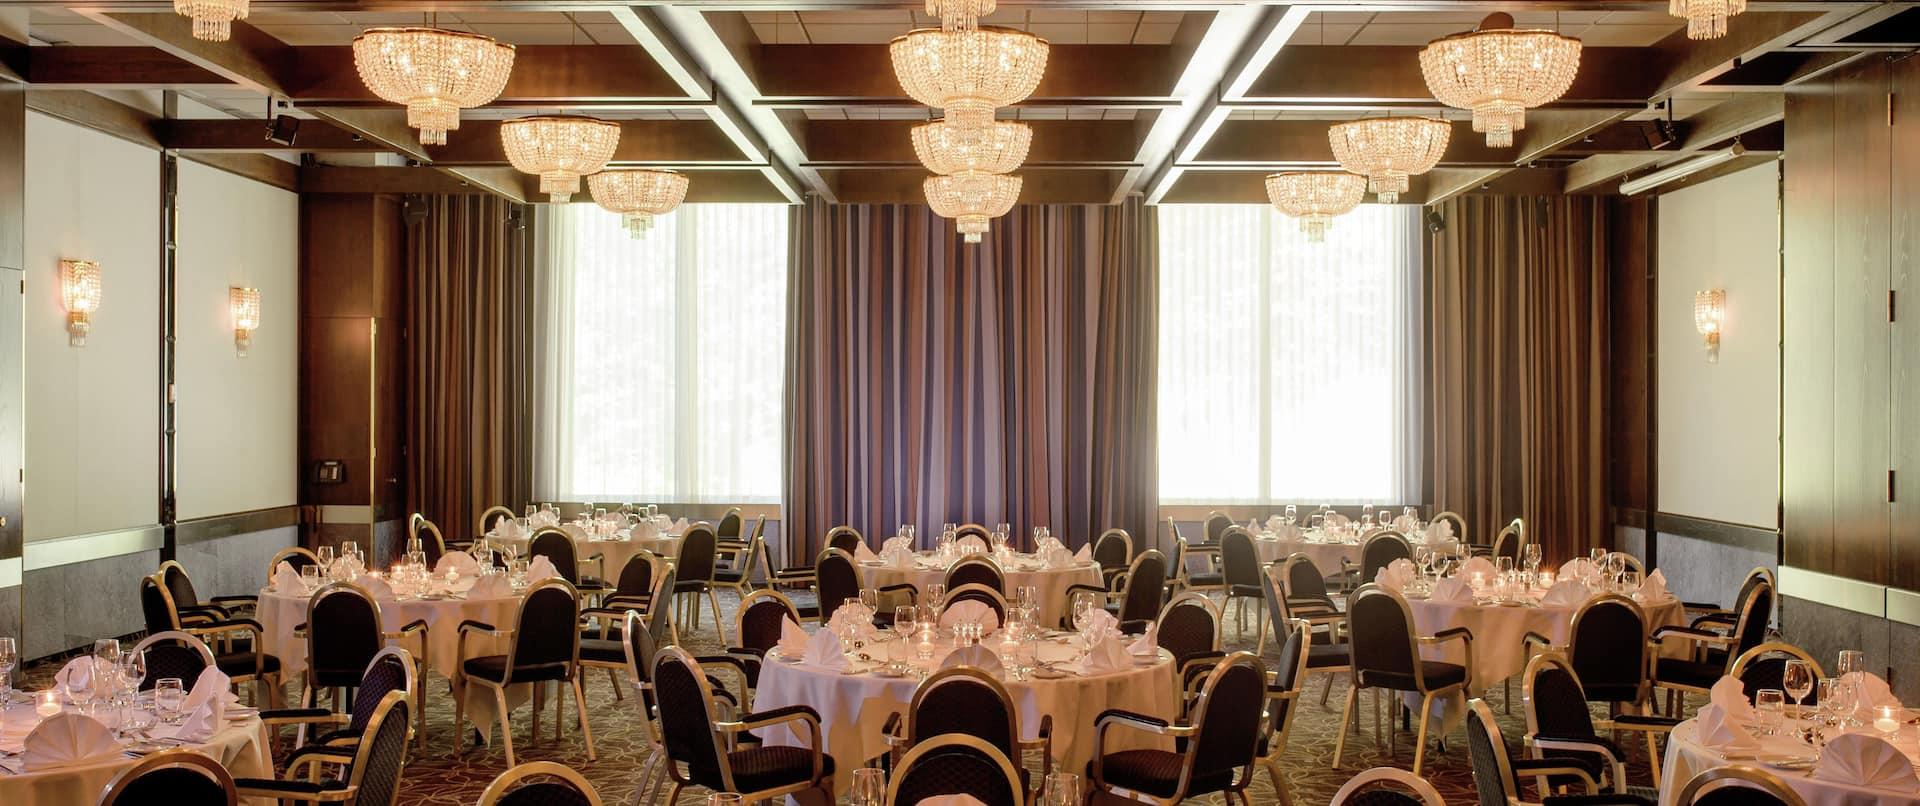 Banquet Room La Place